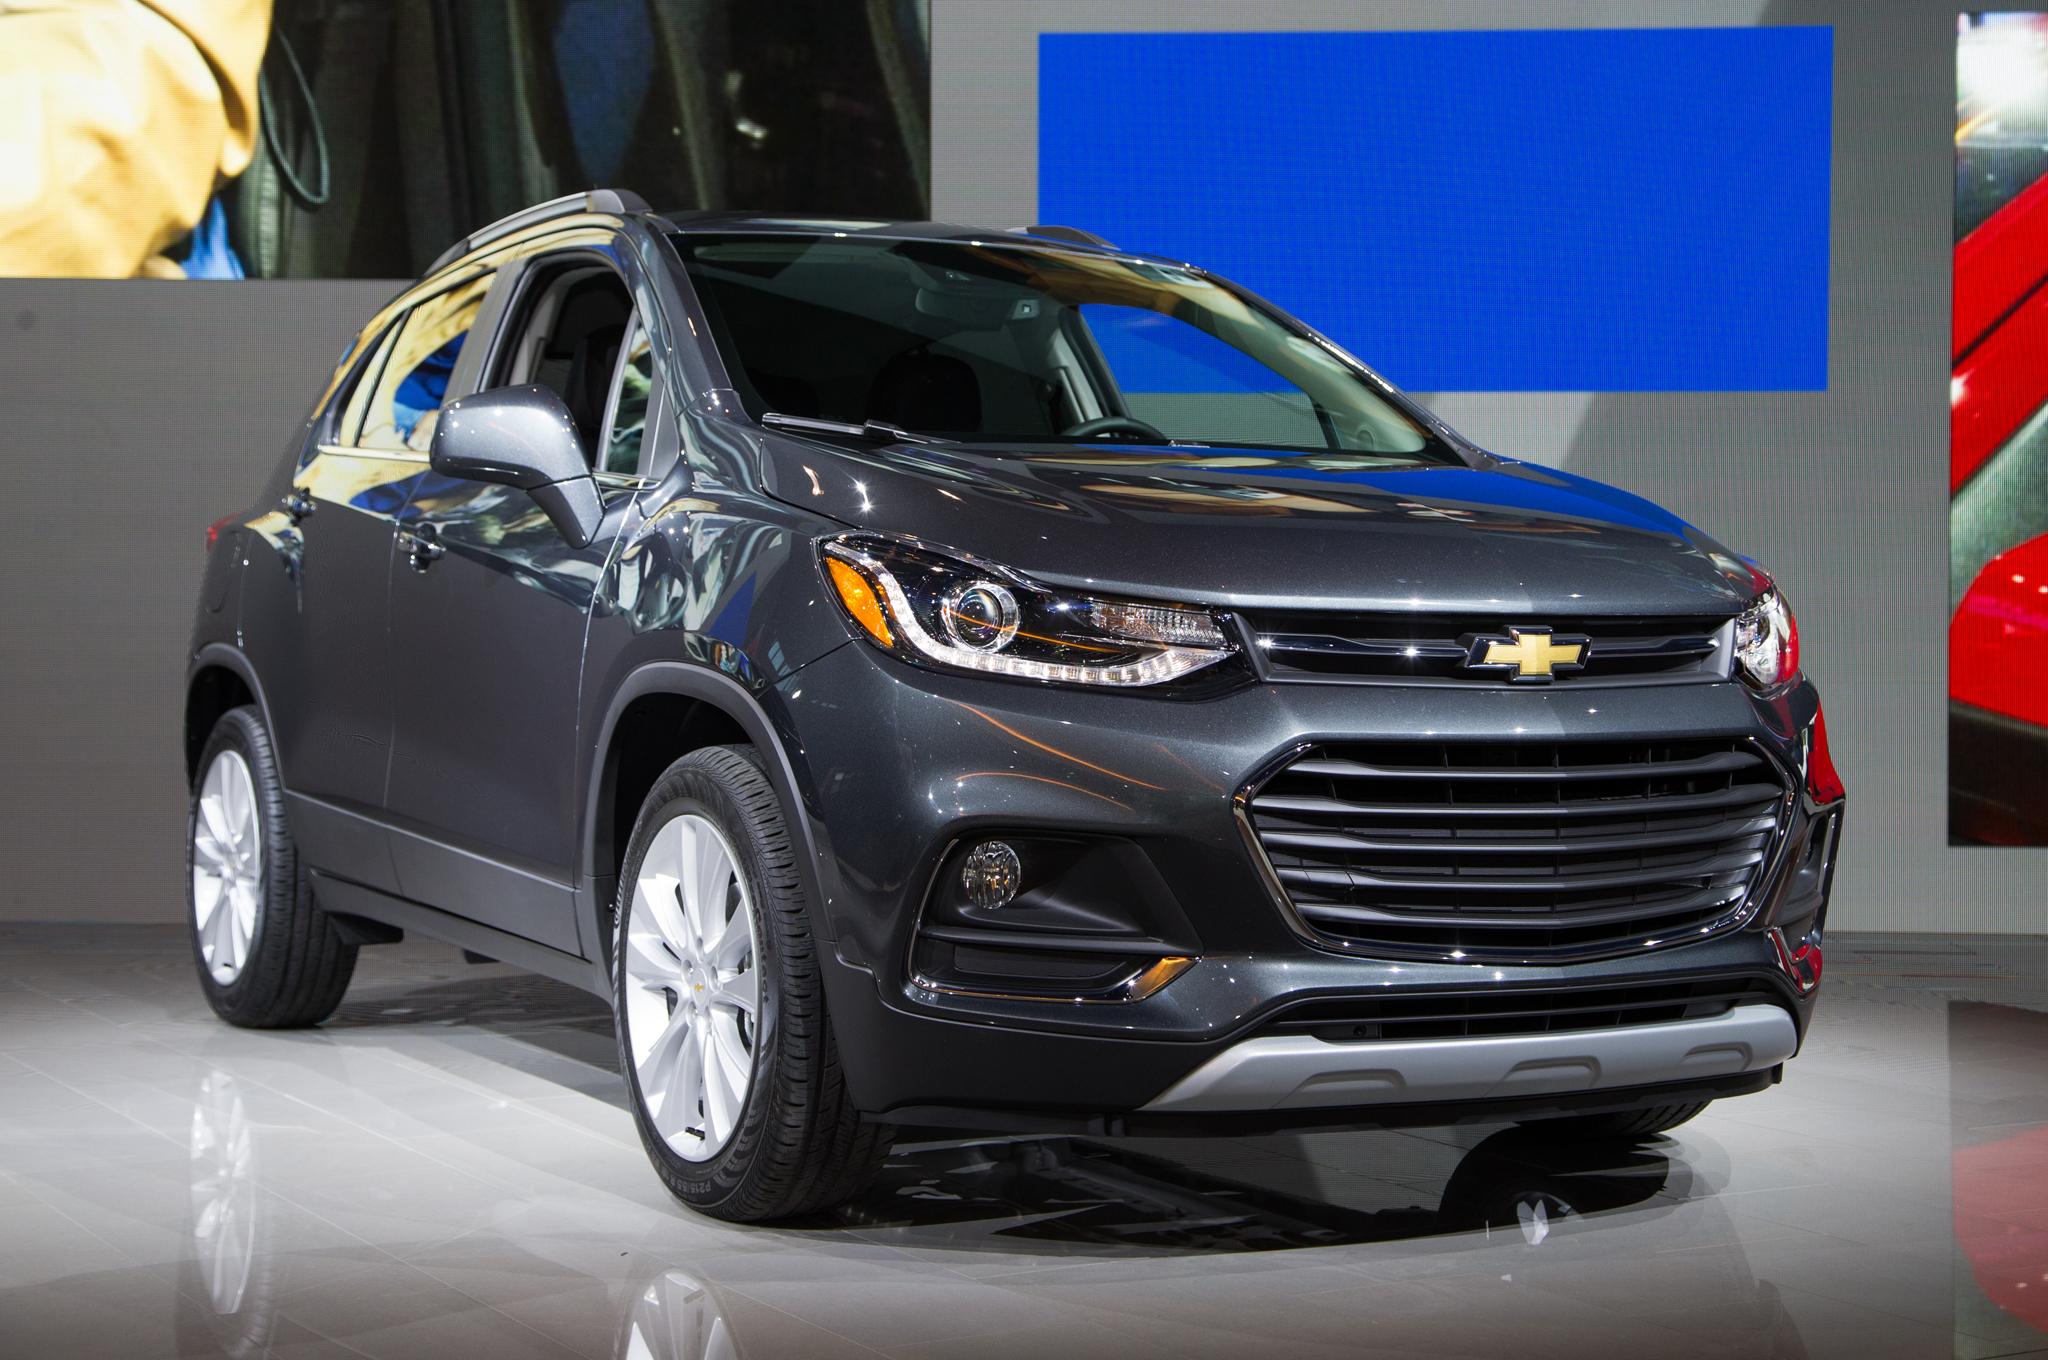 2017 Chevrolet Trax Front Three Quarter